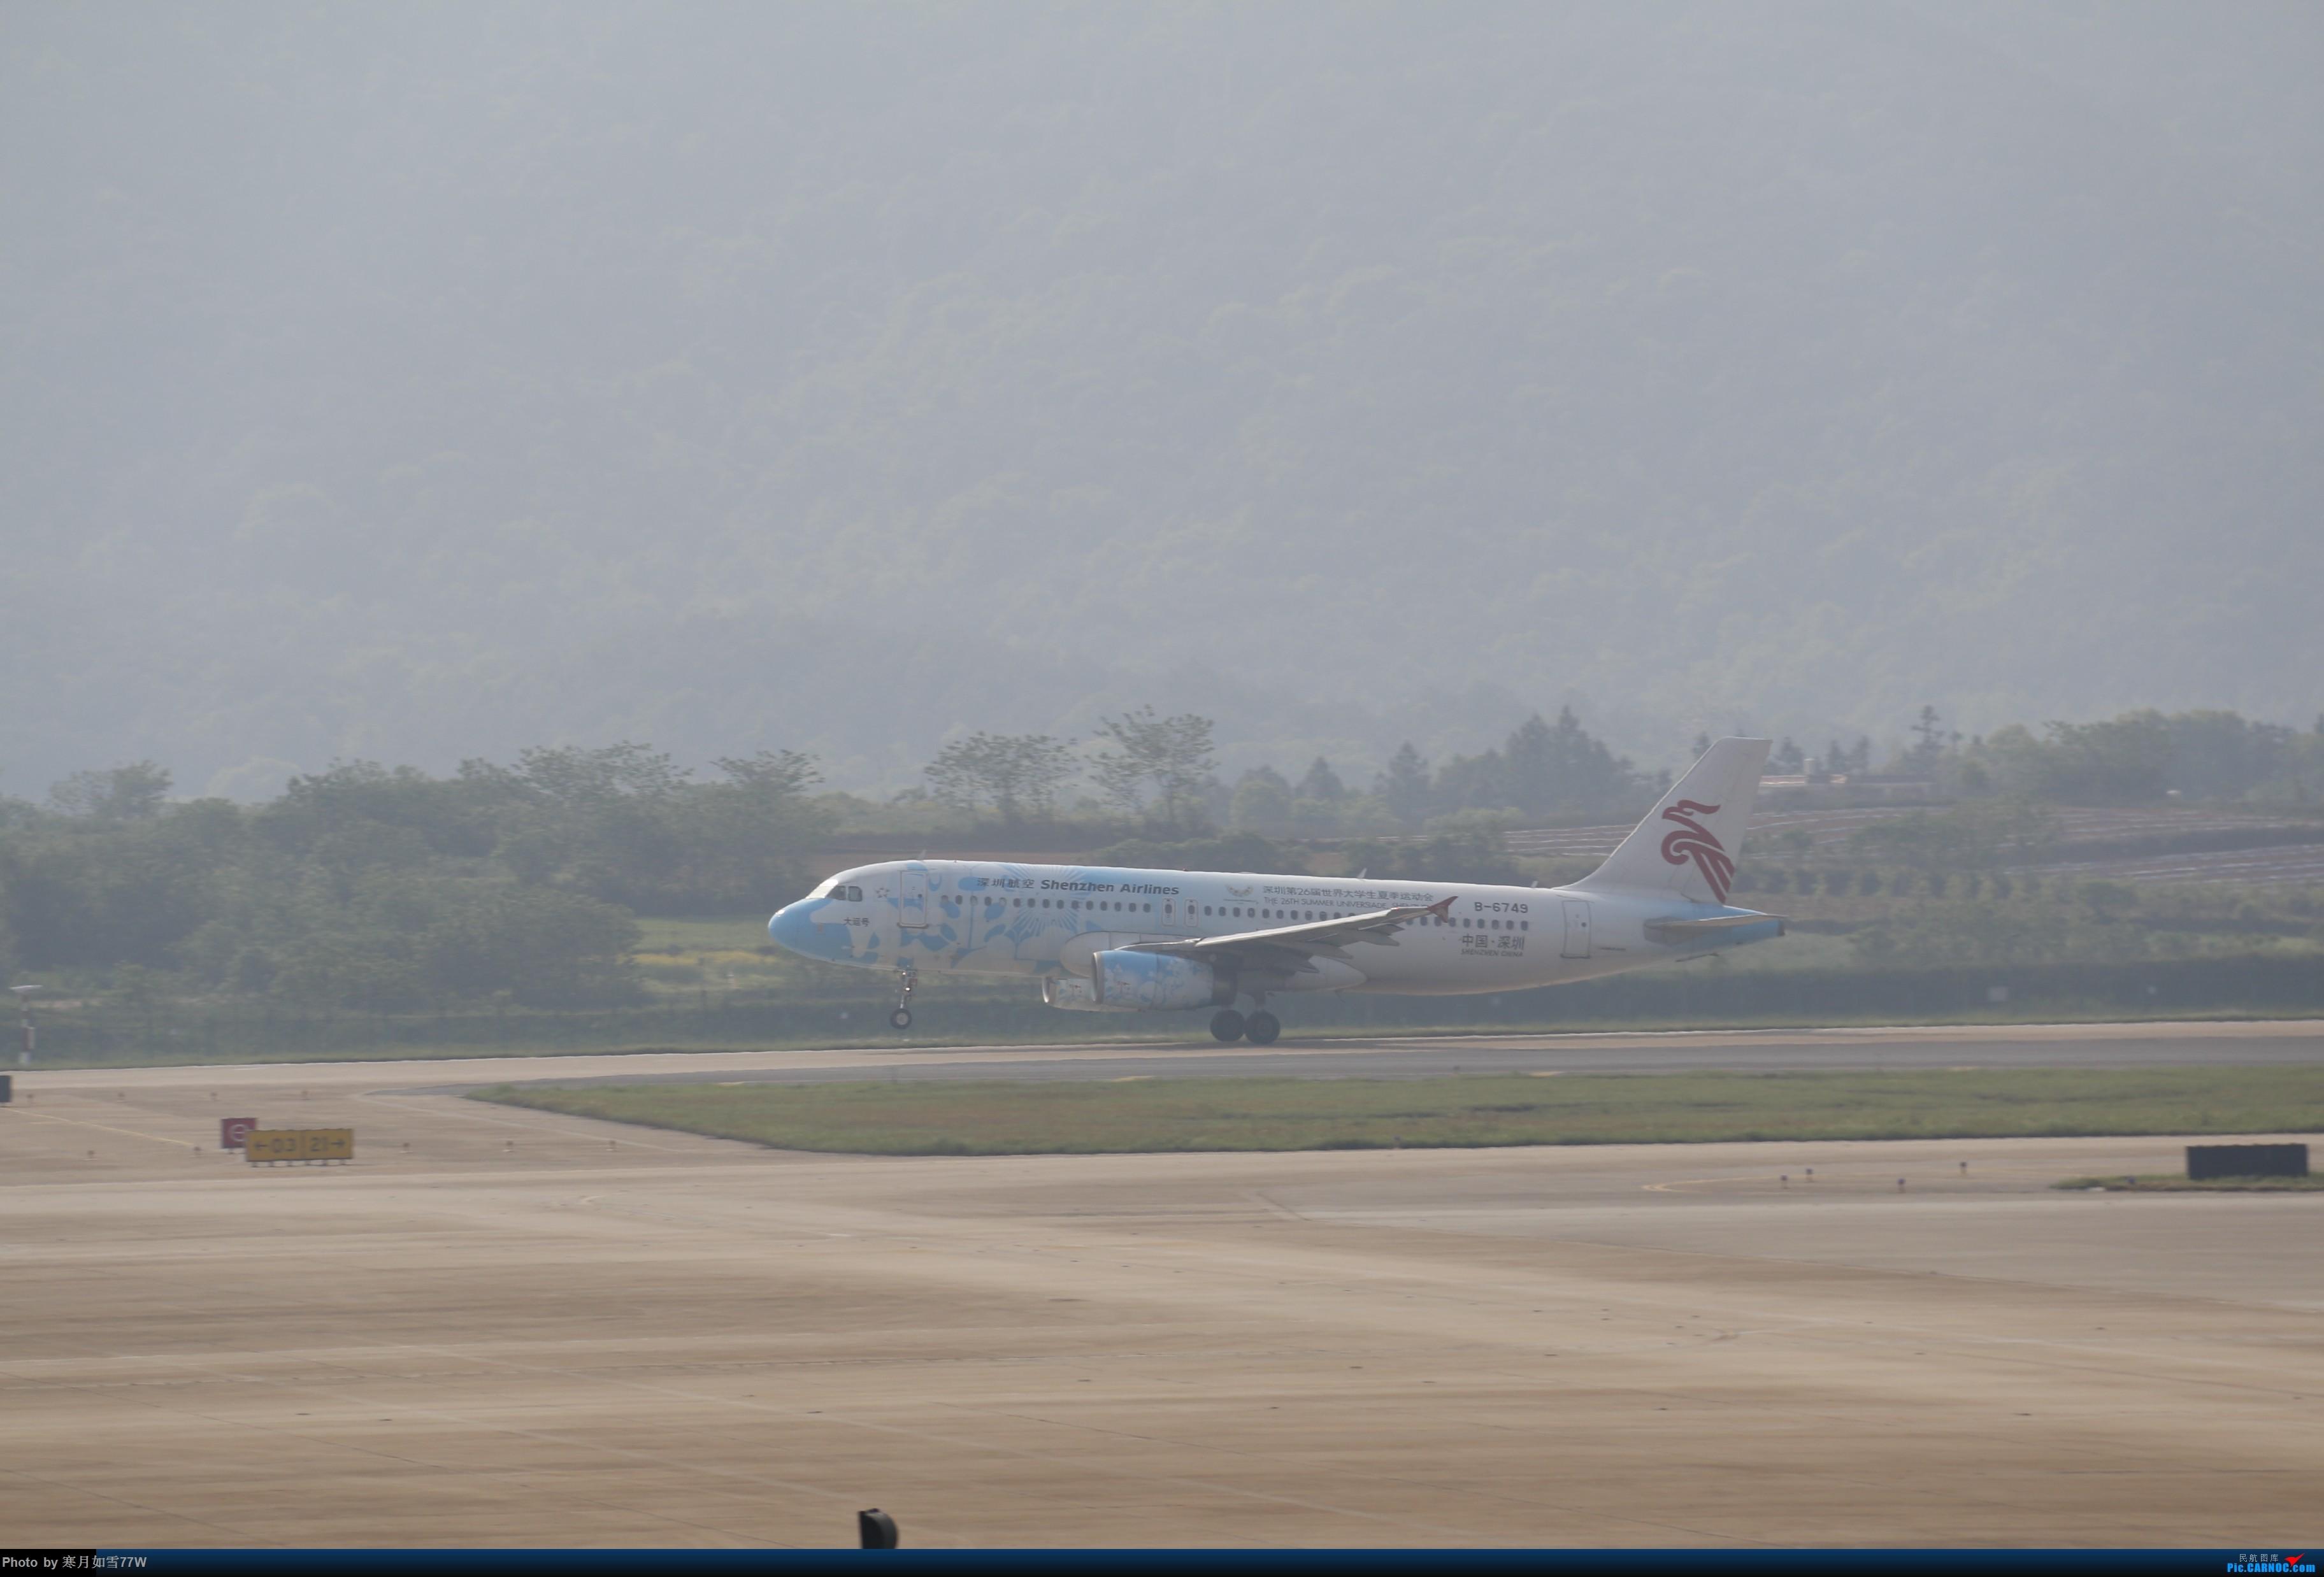 Re:[原创][KHN]昌北拍机 南航321起飞一张 AIRBUS A320-200 B-6749 中国南昌昌北国际机场